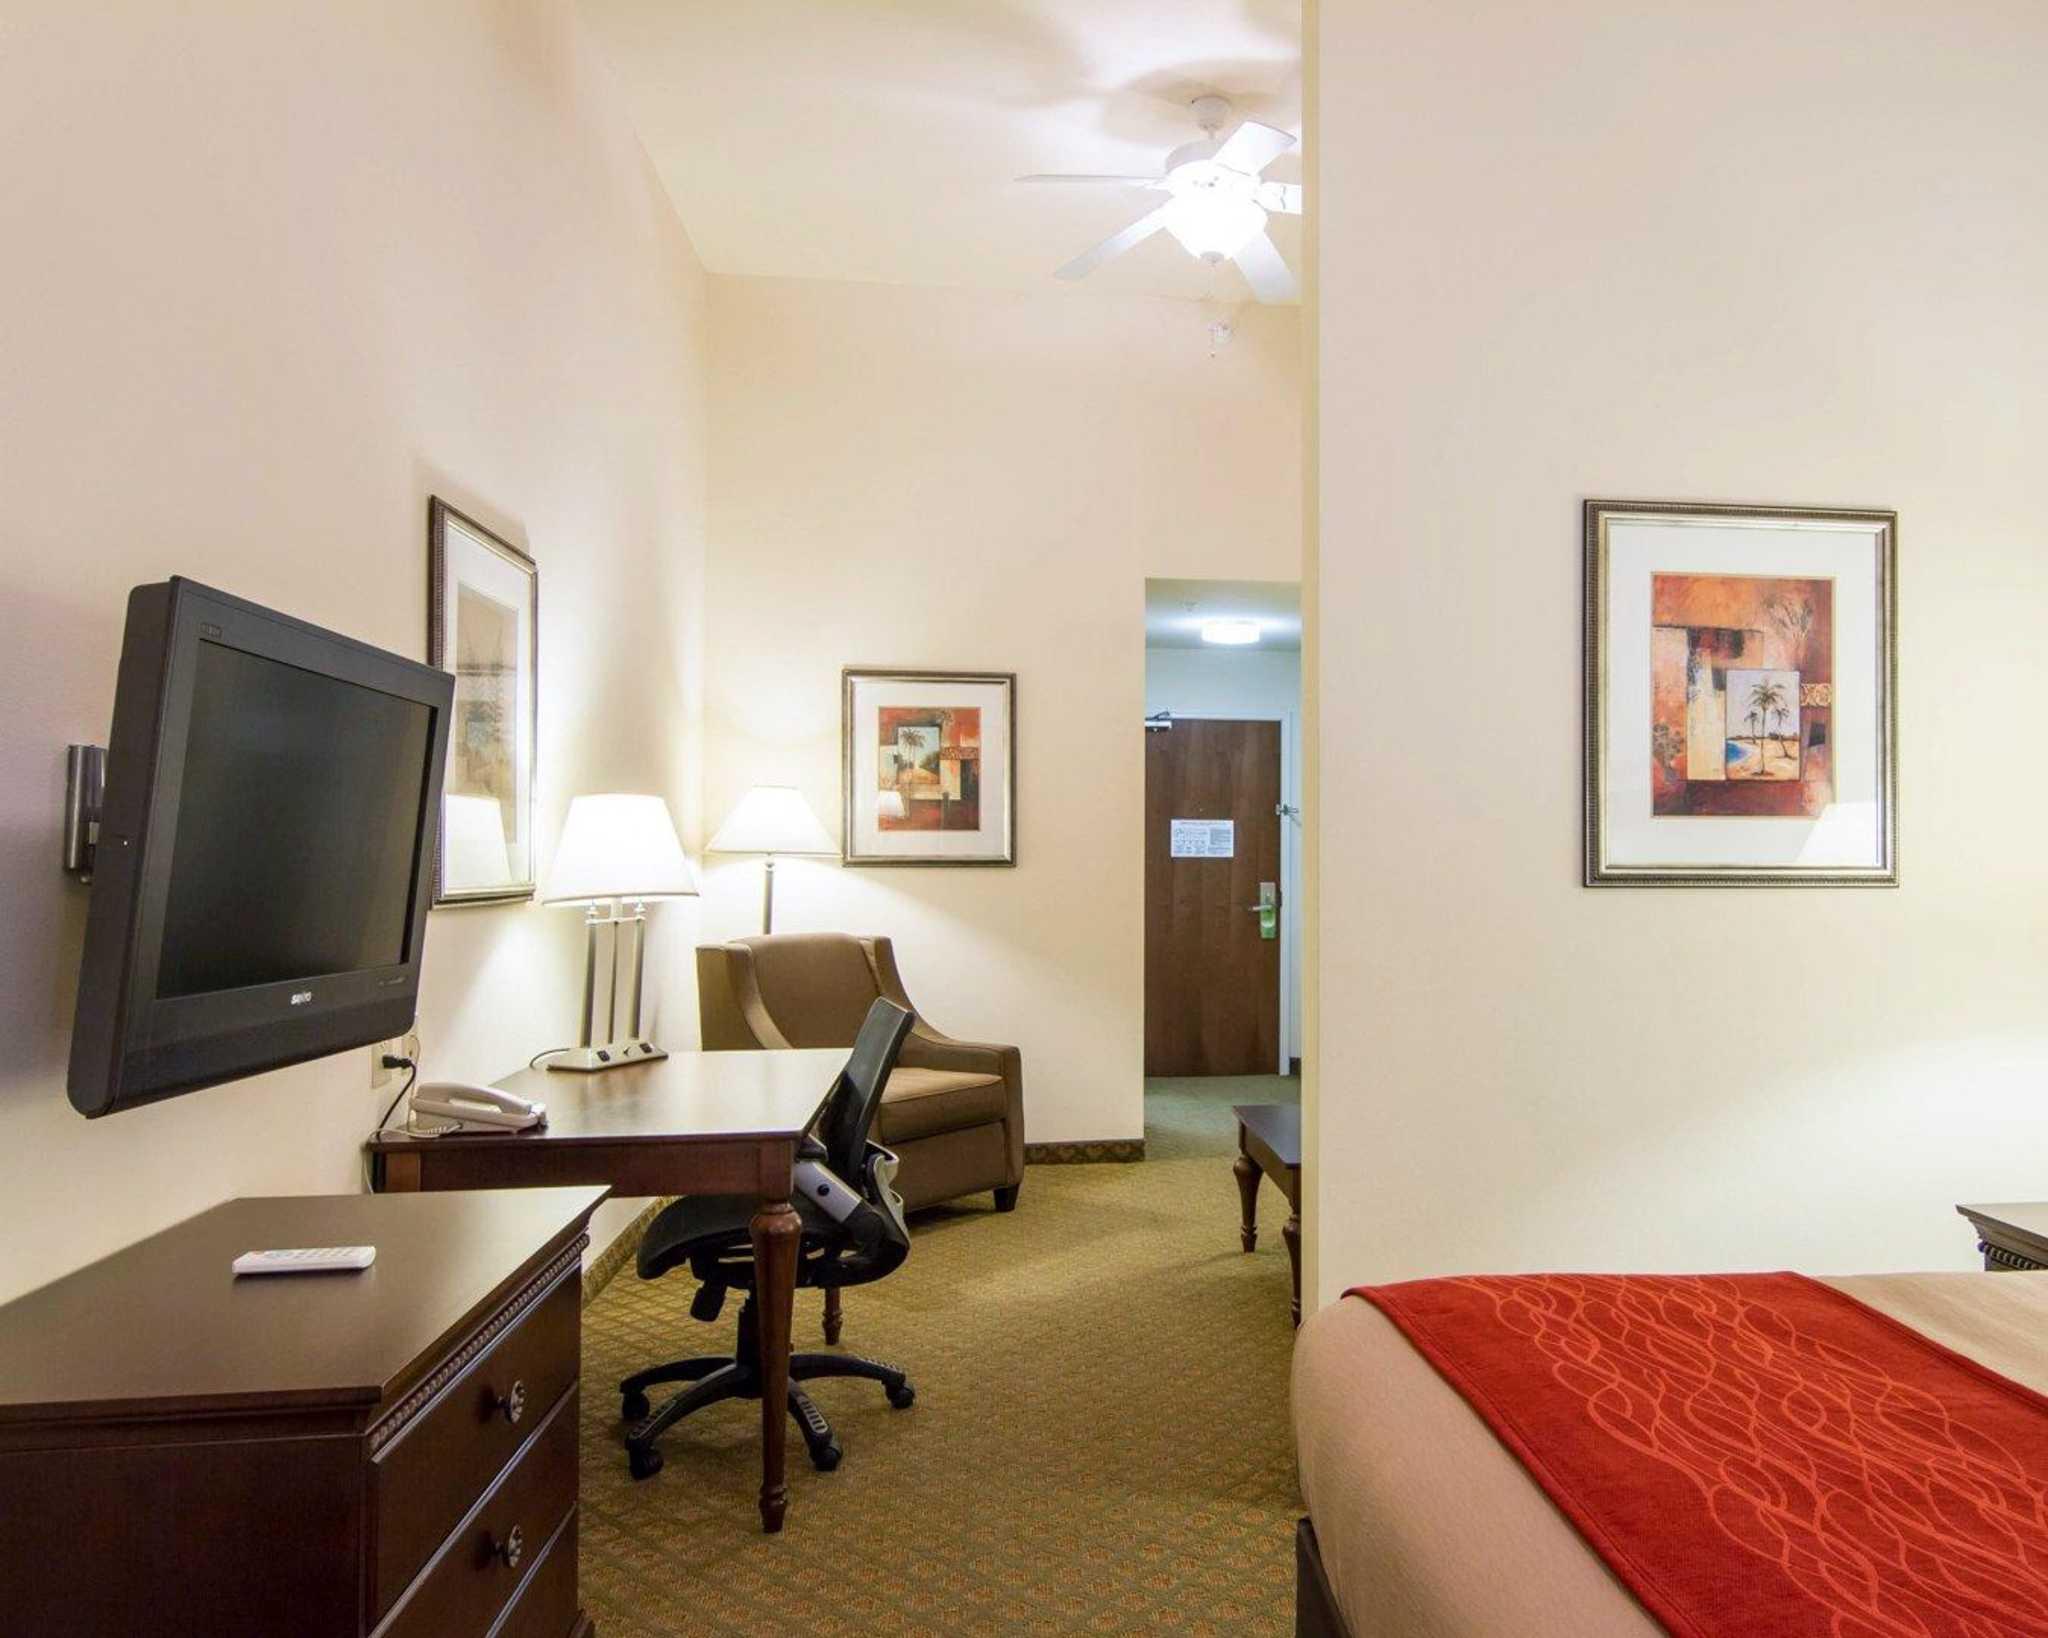 Comfort Inn & Suites Airport image 23